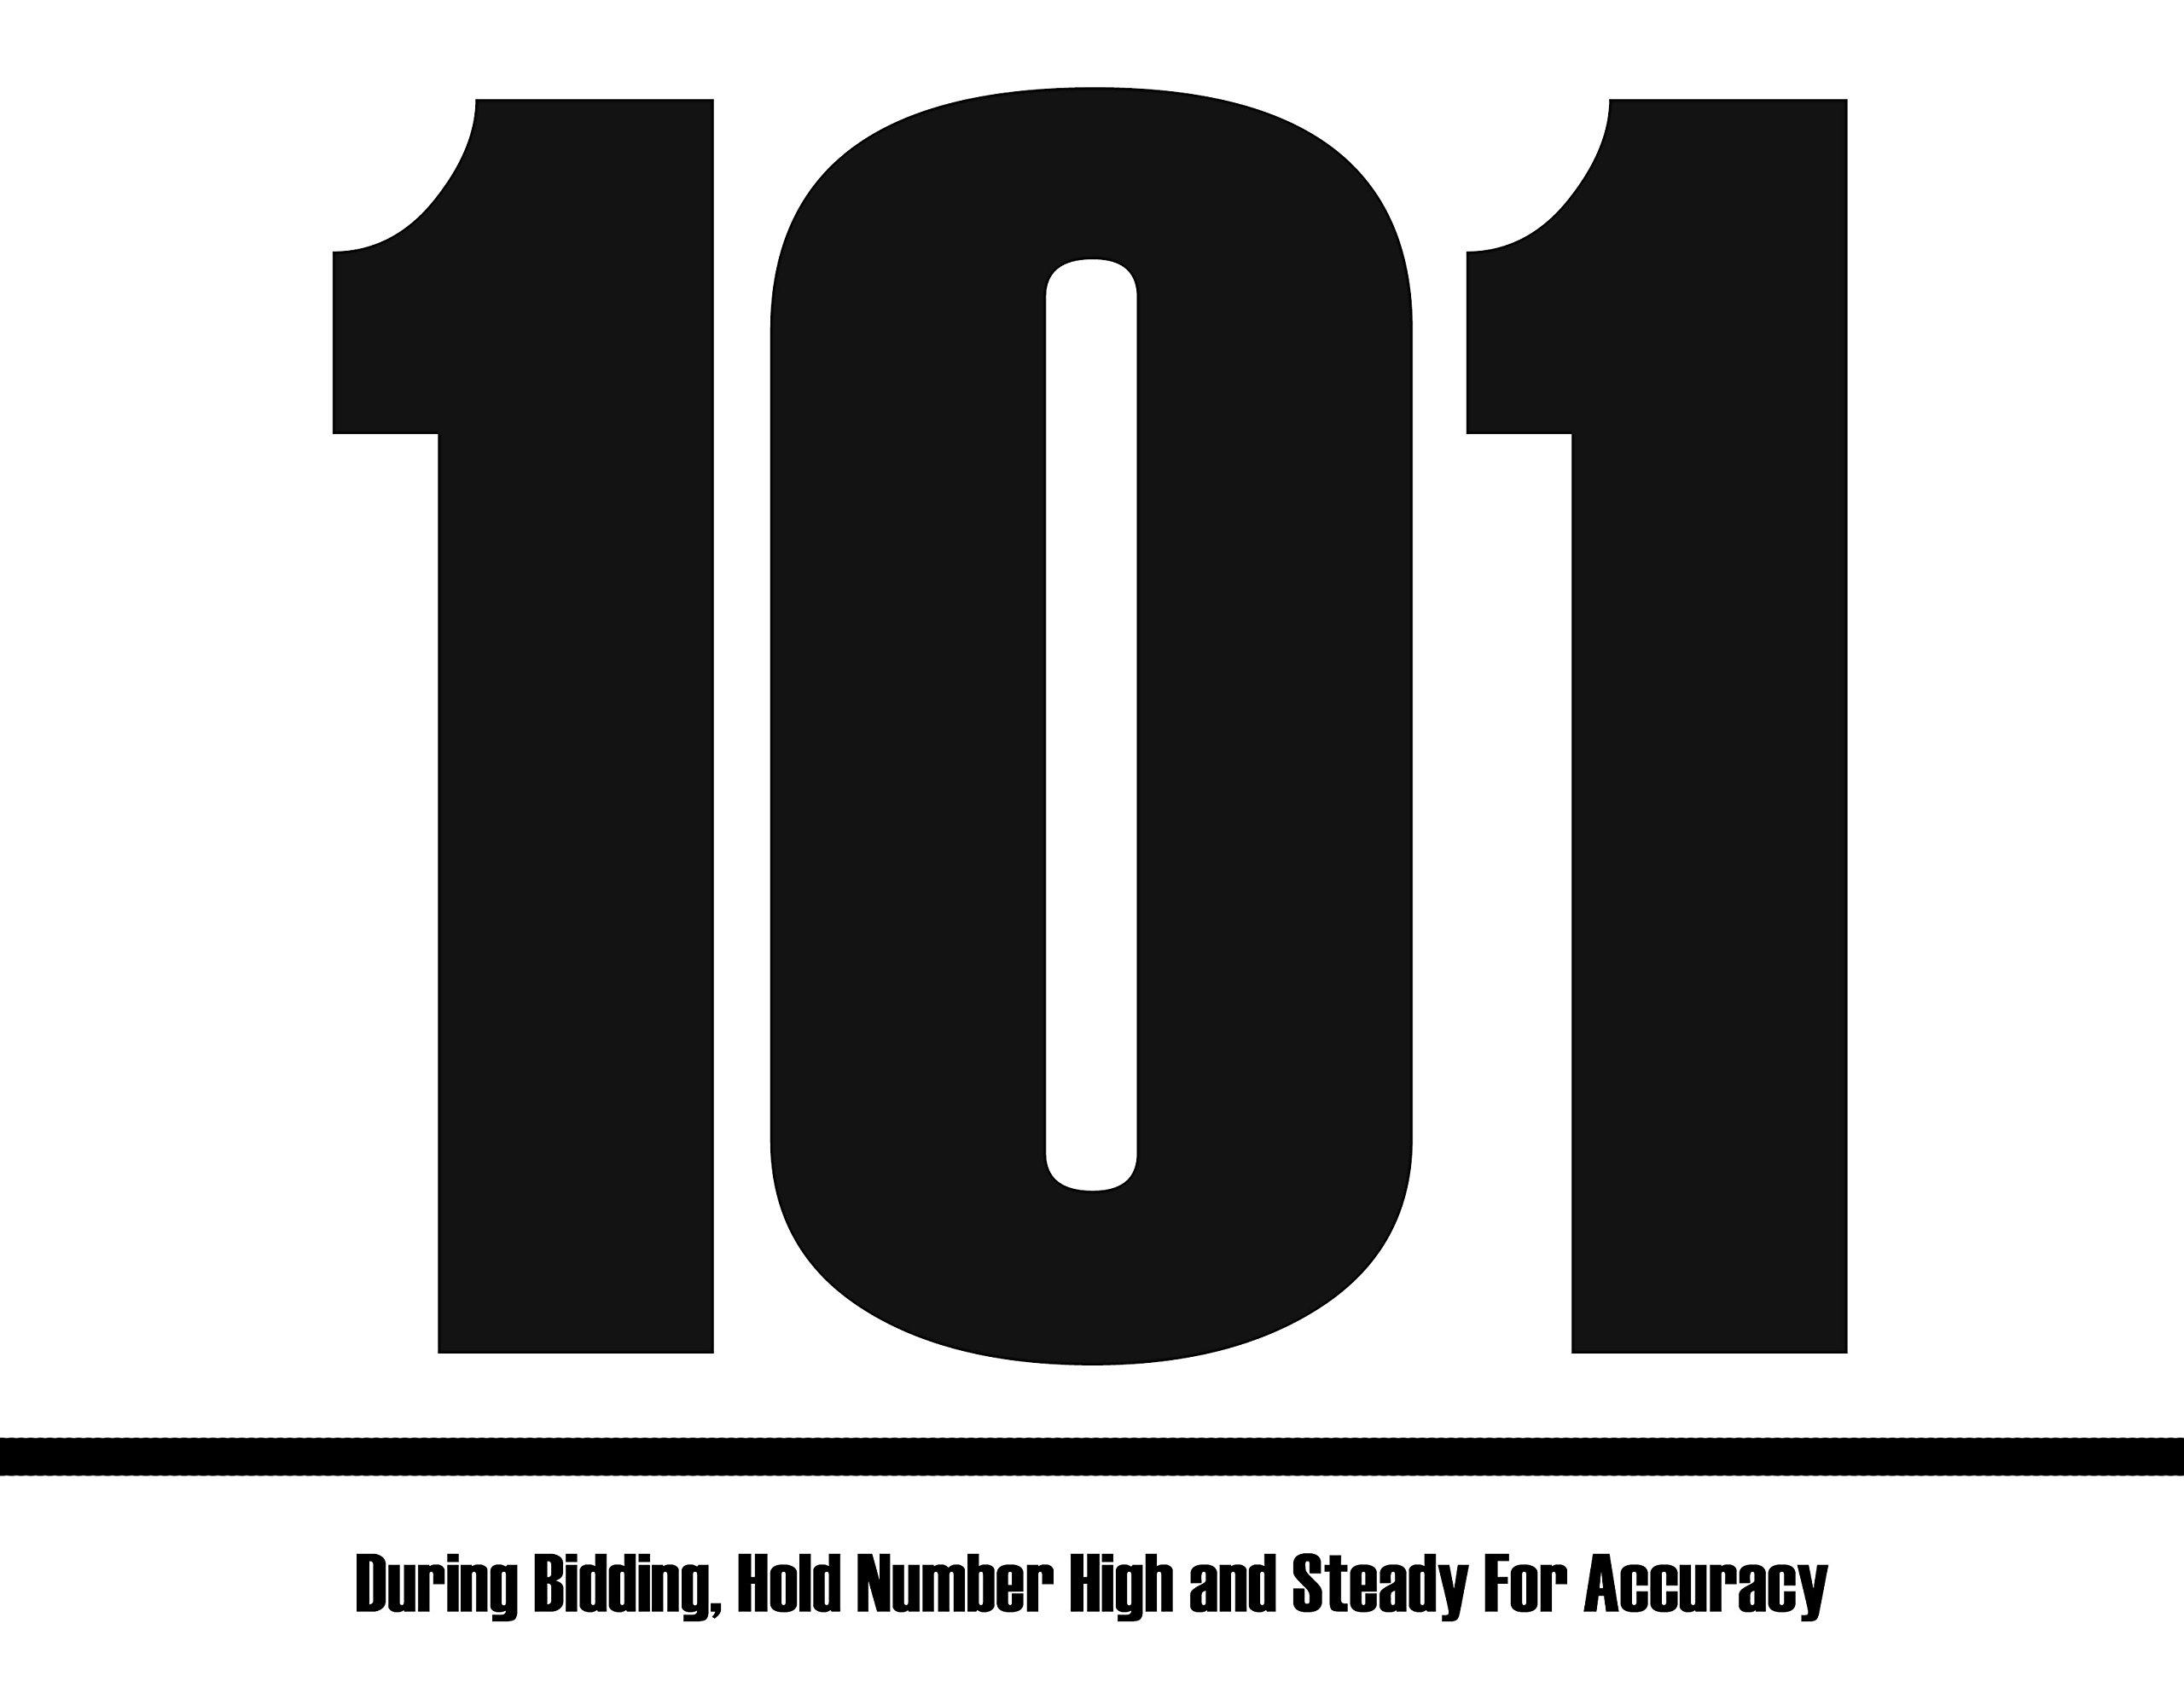 Bid Card - 101-200 (8.5-x-11-inch)